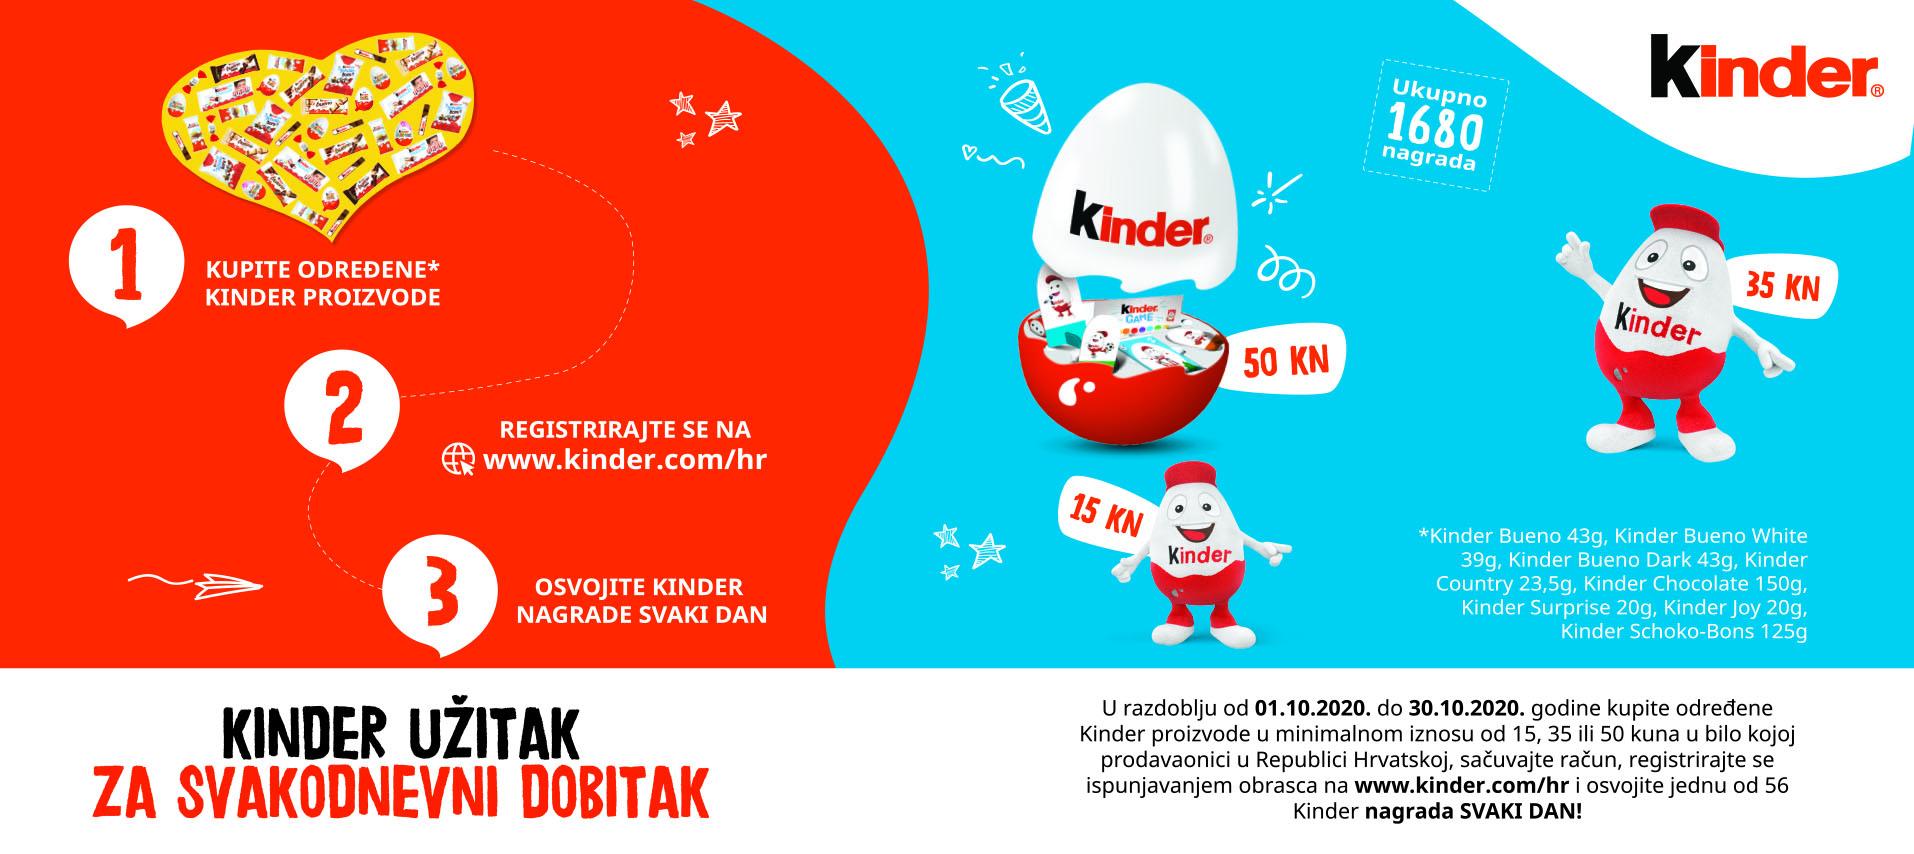 kinder_1920x857_kr.jpg